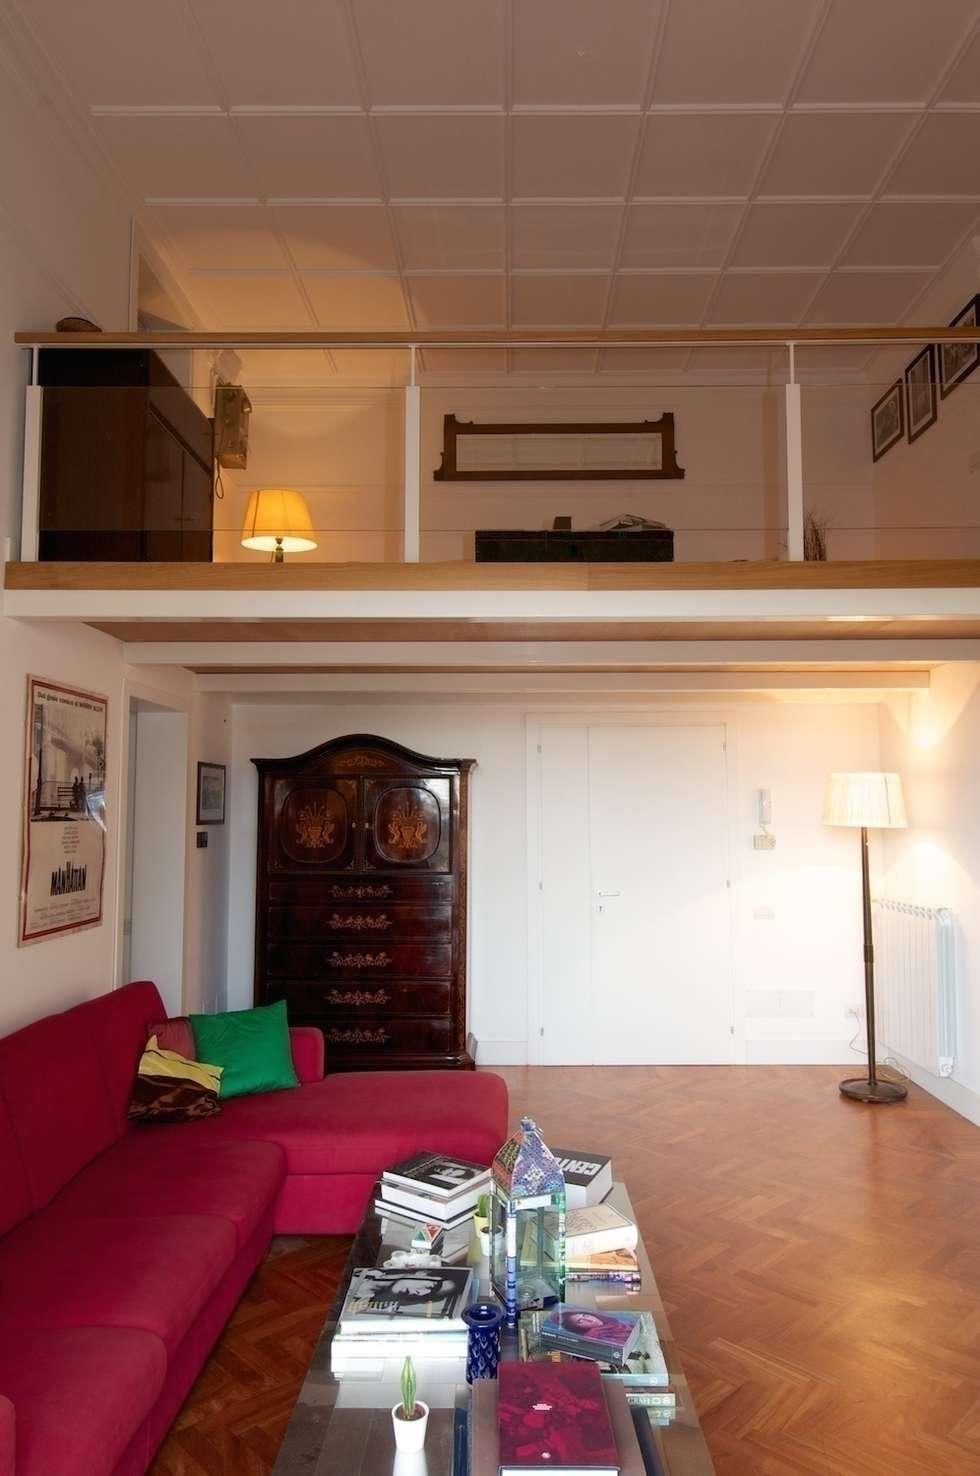 Idee arredamento casa interior design homify for Arredare moderno e antico